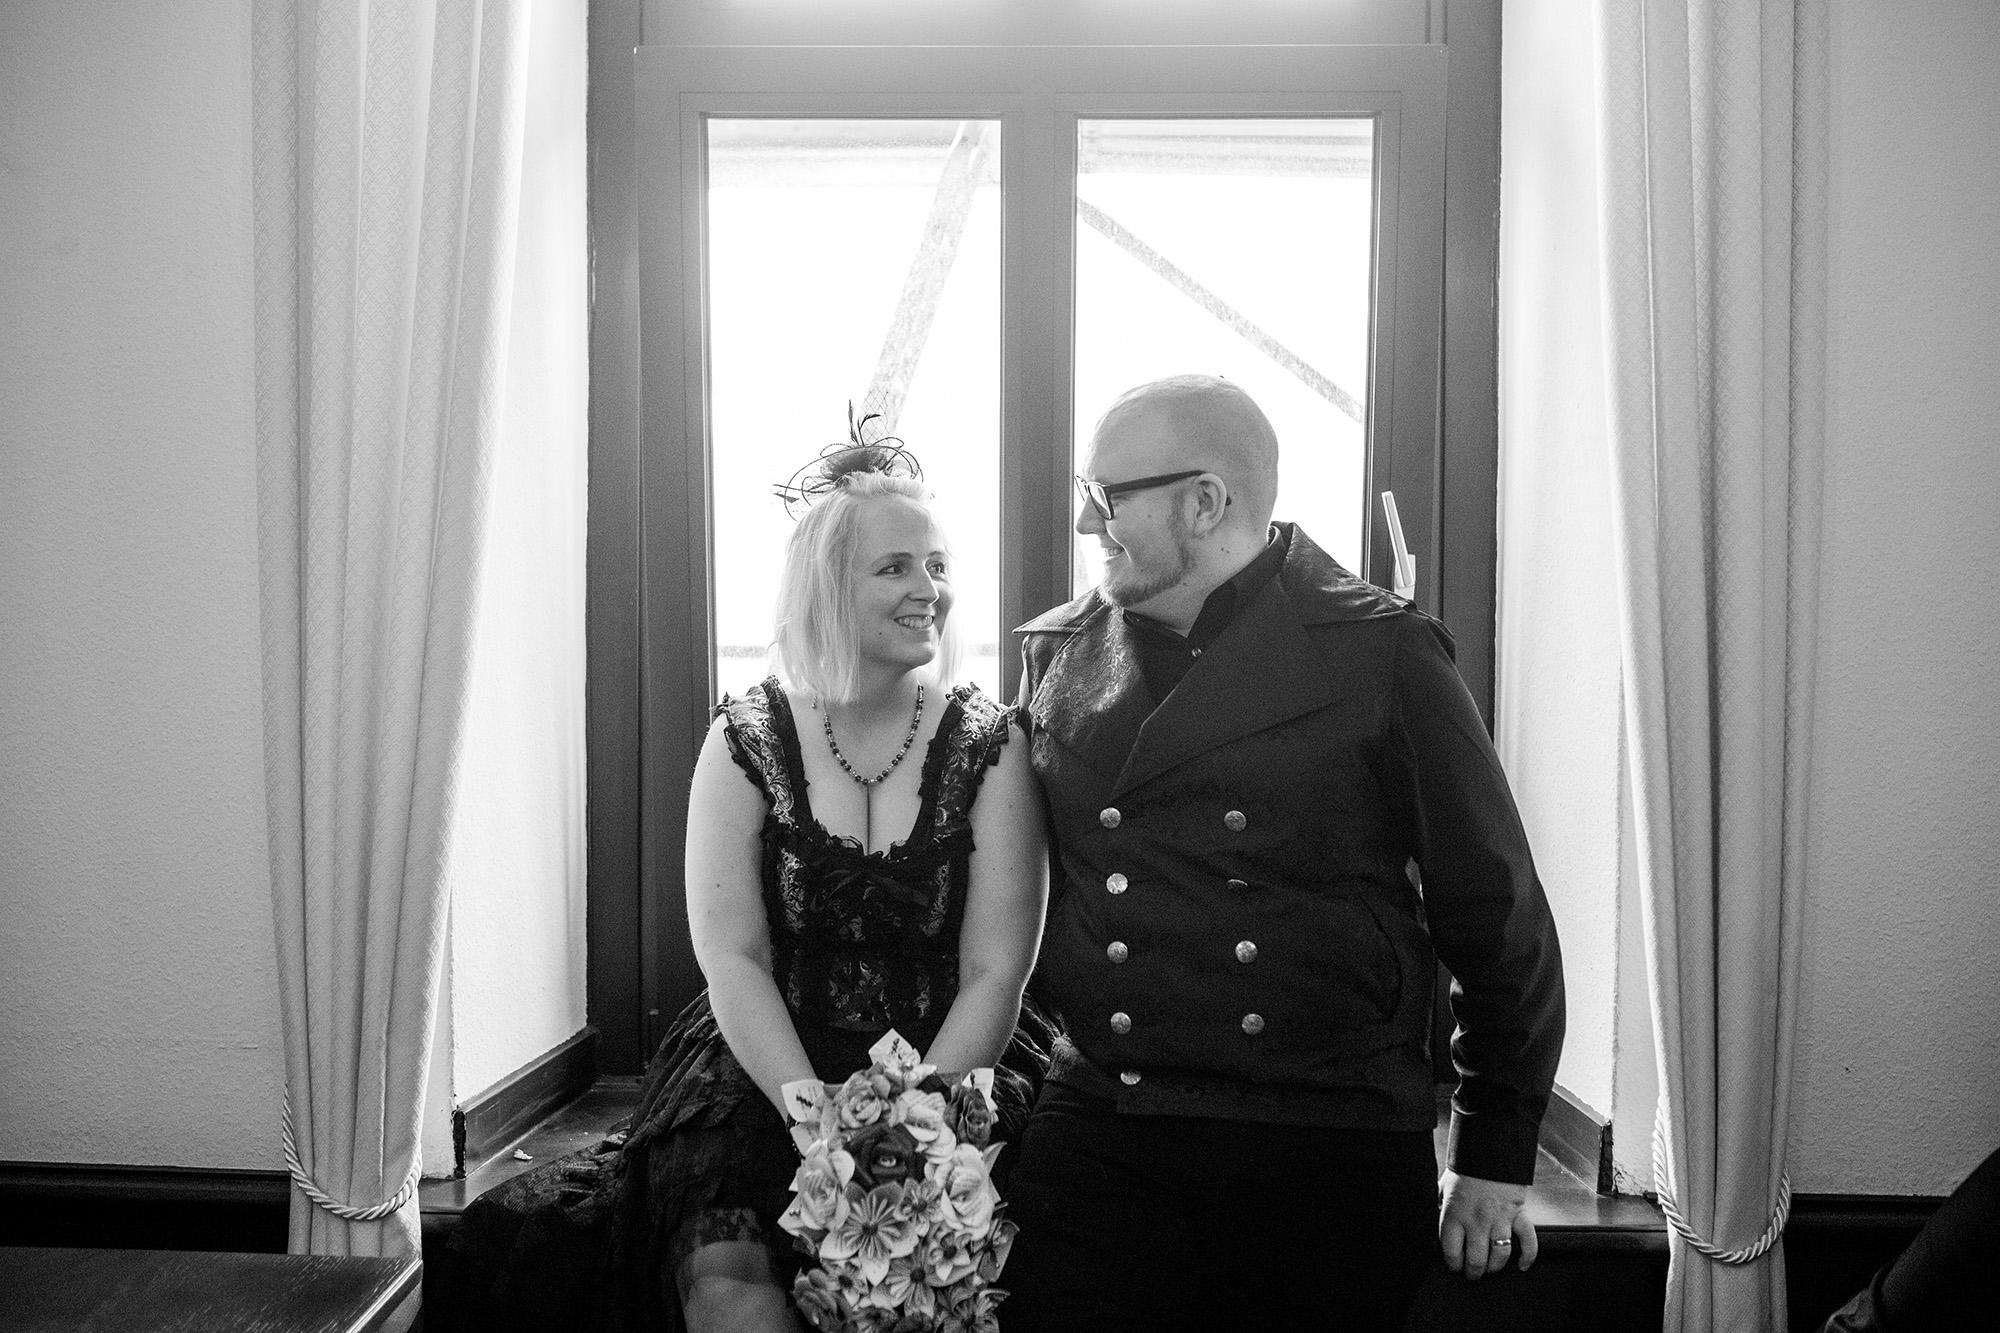 Seriously_Sabrina_Photography_Essen_Germany_RocknRoll_Hochzeit_Wedding_PatrickJenny28.jpg